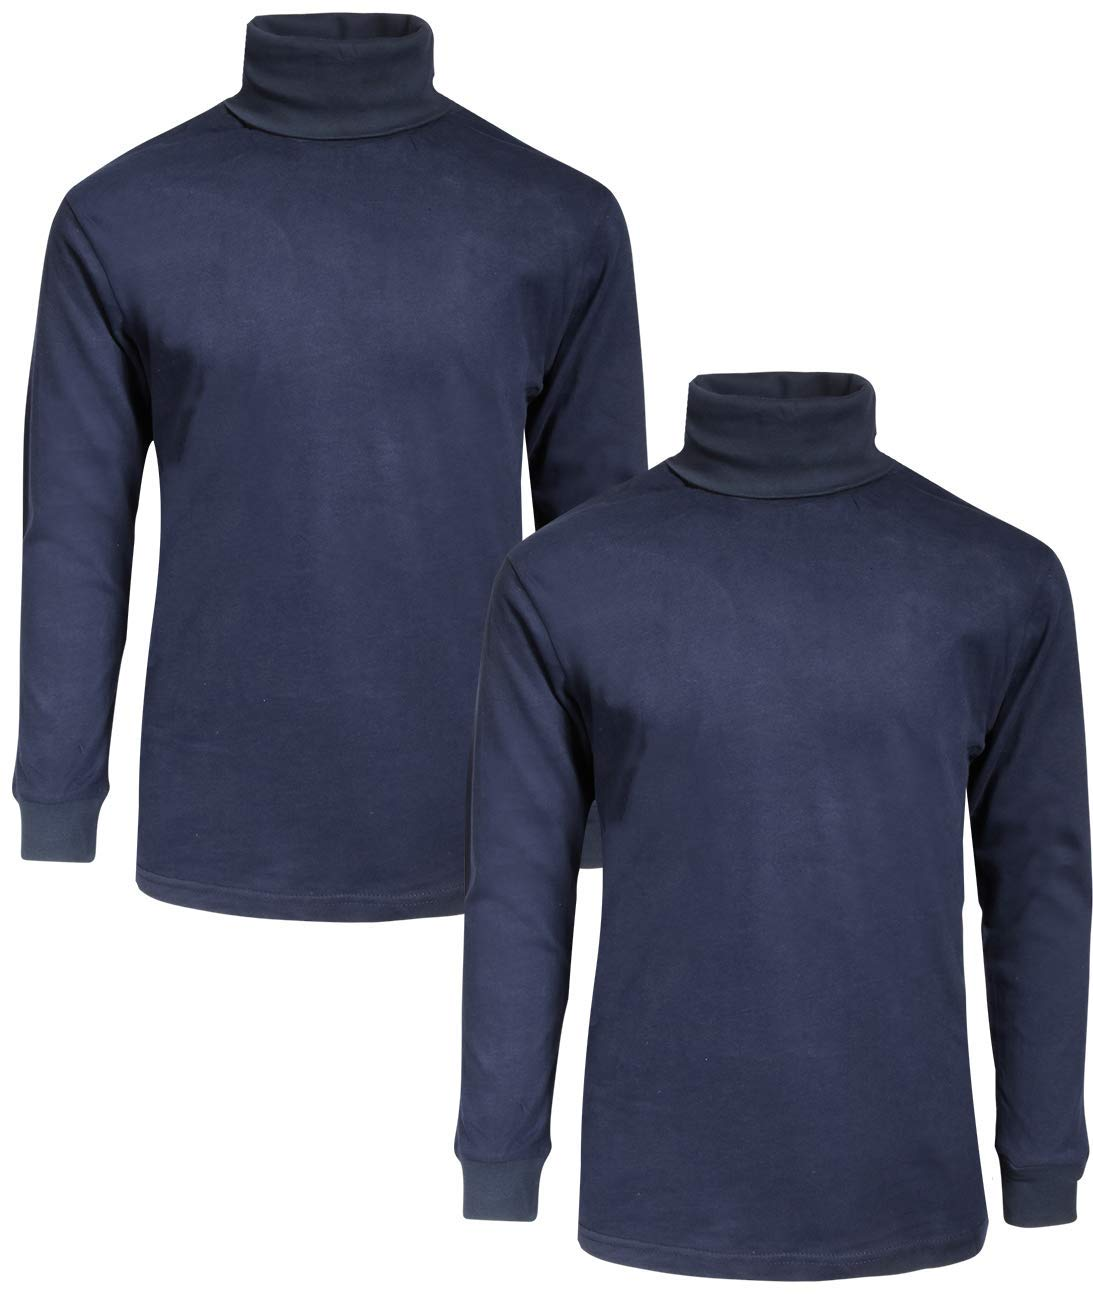 Beverly Hills Polo Club Boy's School Uniform 2-Pack Long Sleeve Turtleneck Shirts, Navy/Navy, 8/10'